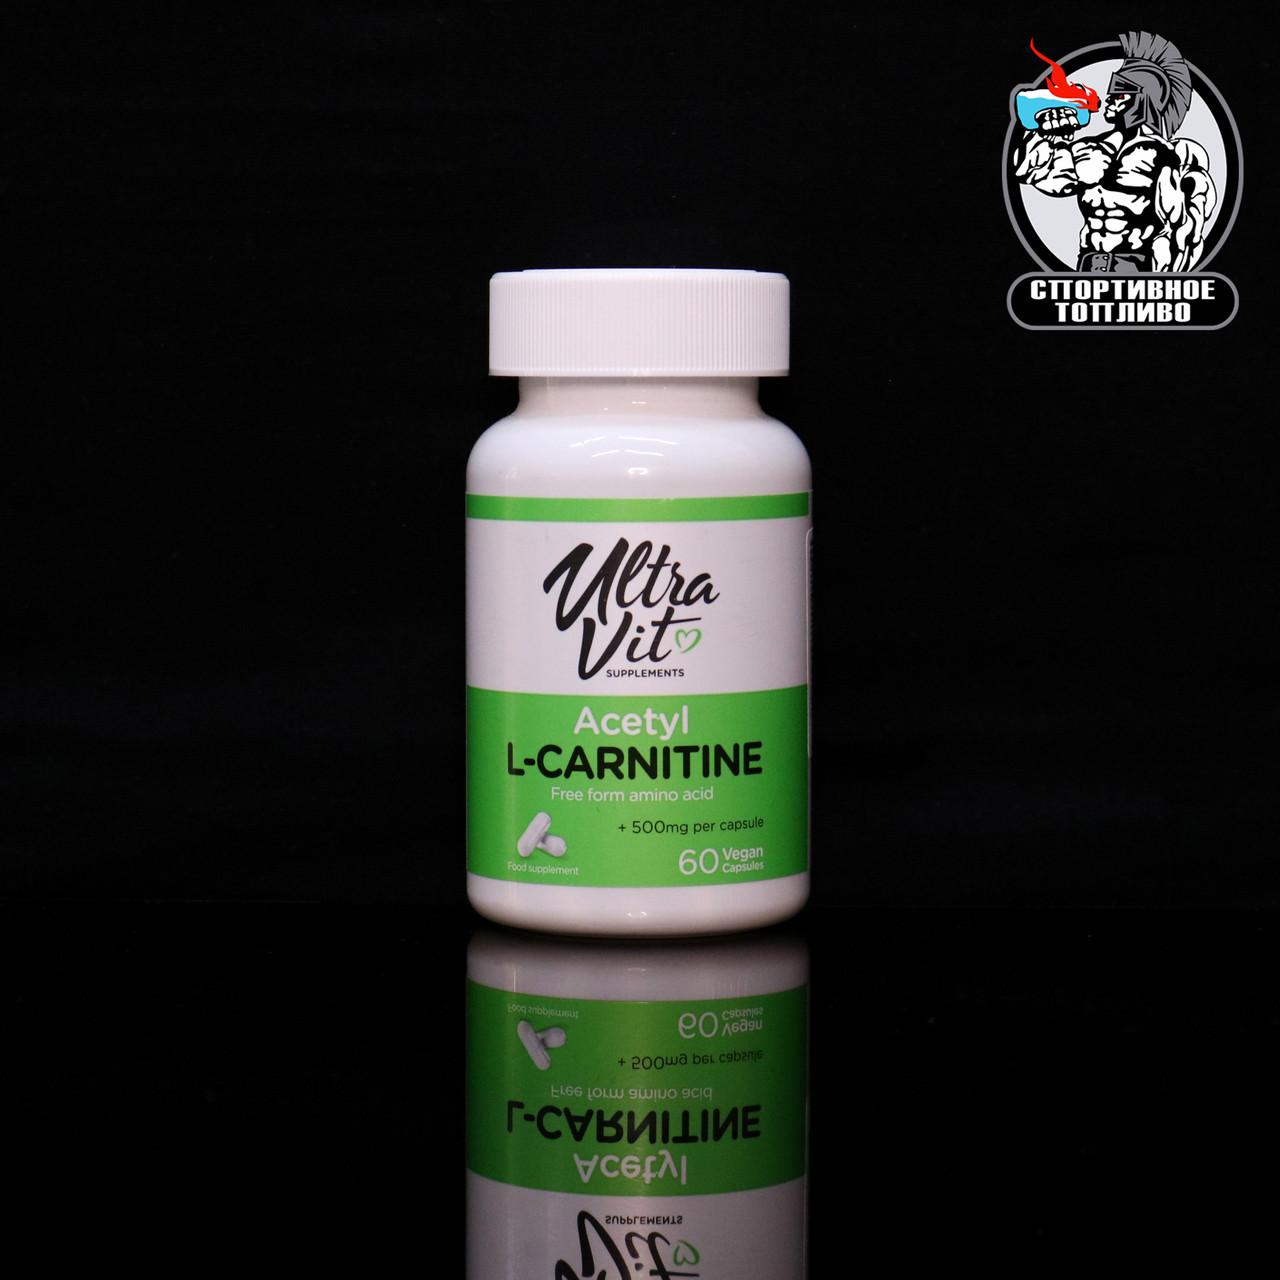 VPLab - Acetyl L-Carnitine 60капс/30порций